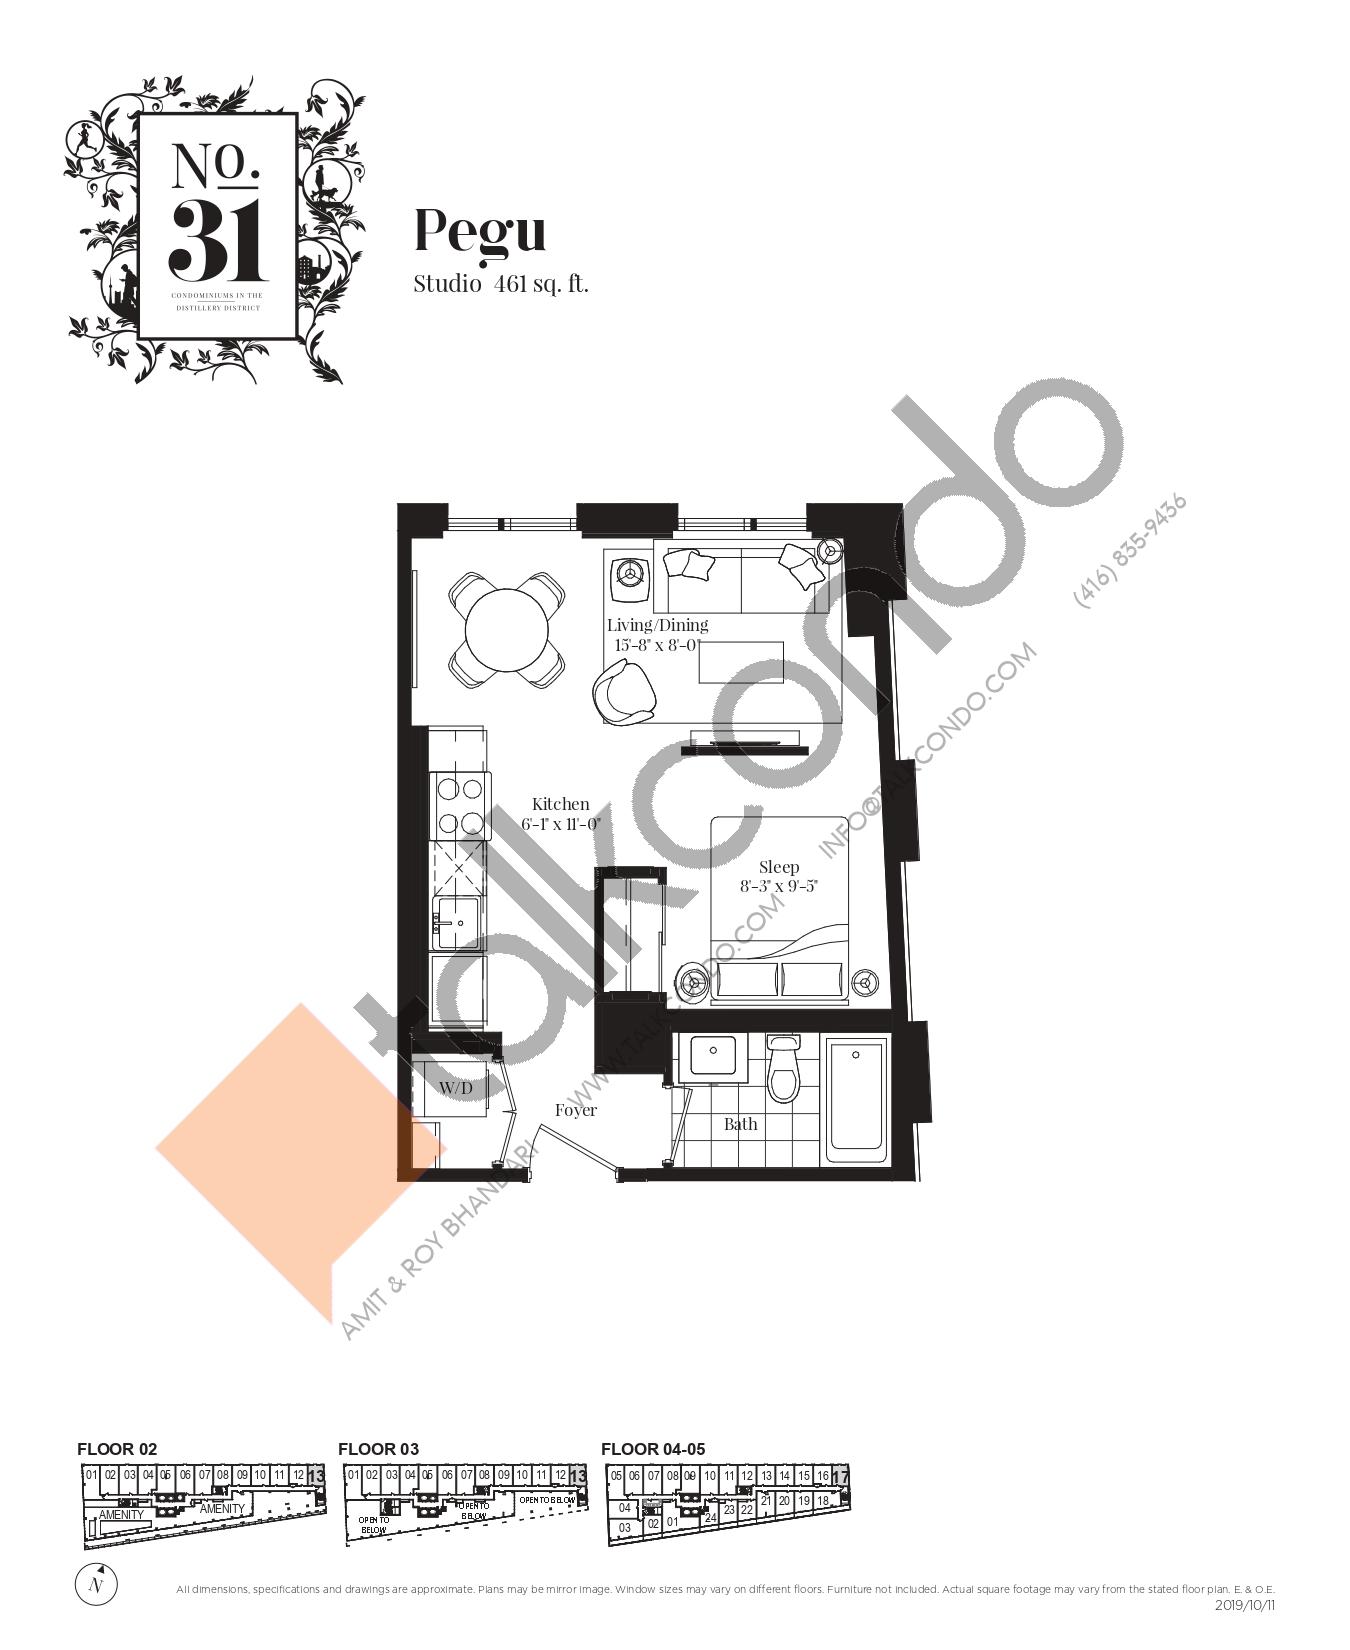 Pegu Floor Plan at No. 31 Condos - 461 sq.ft